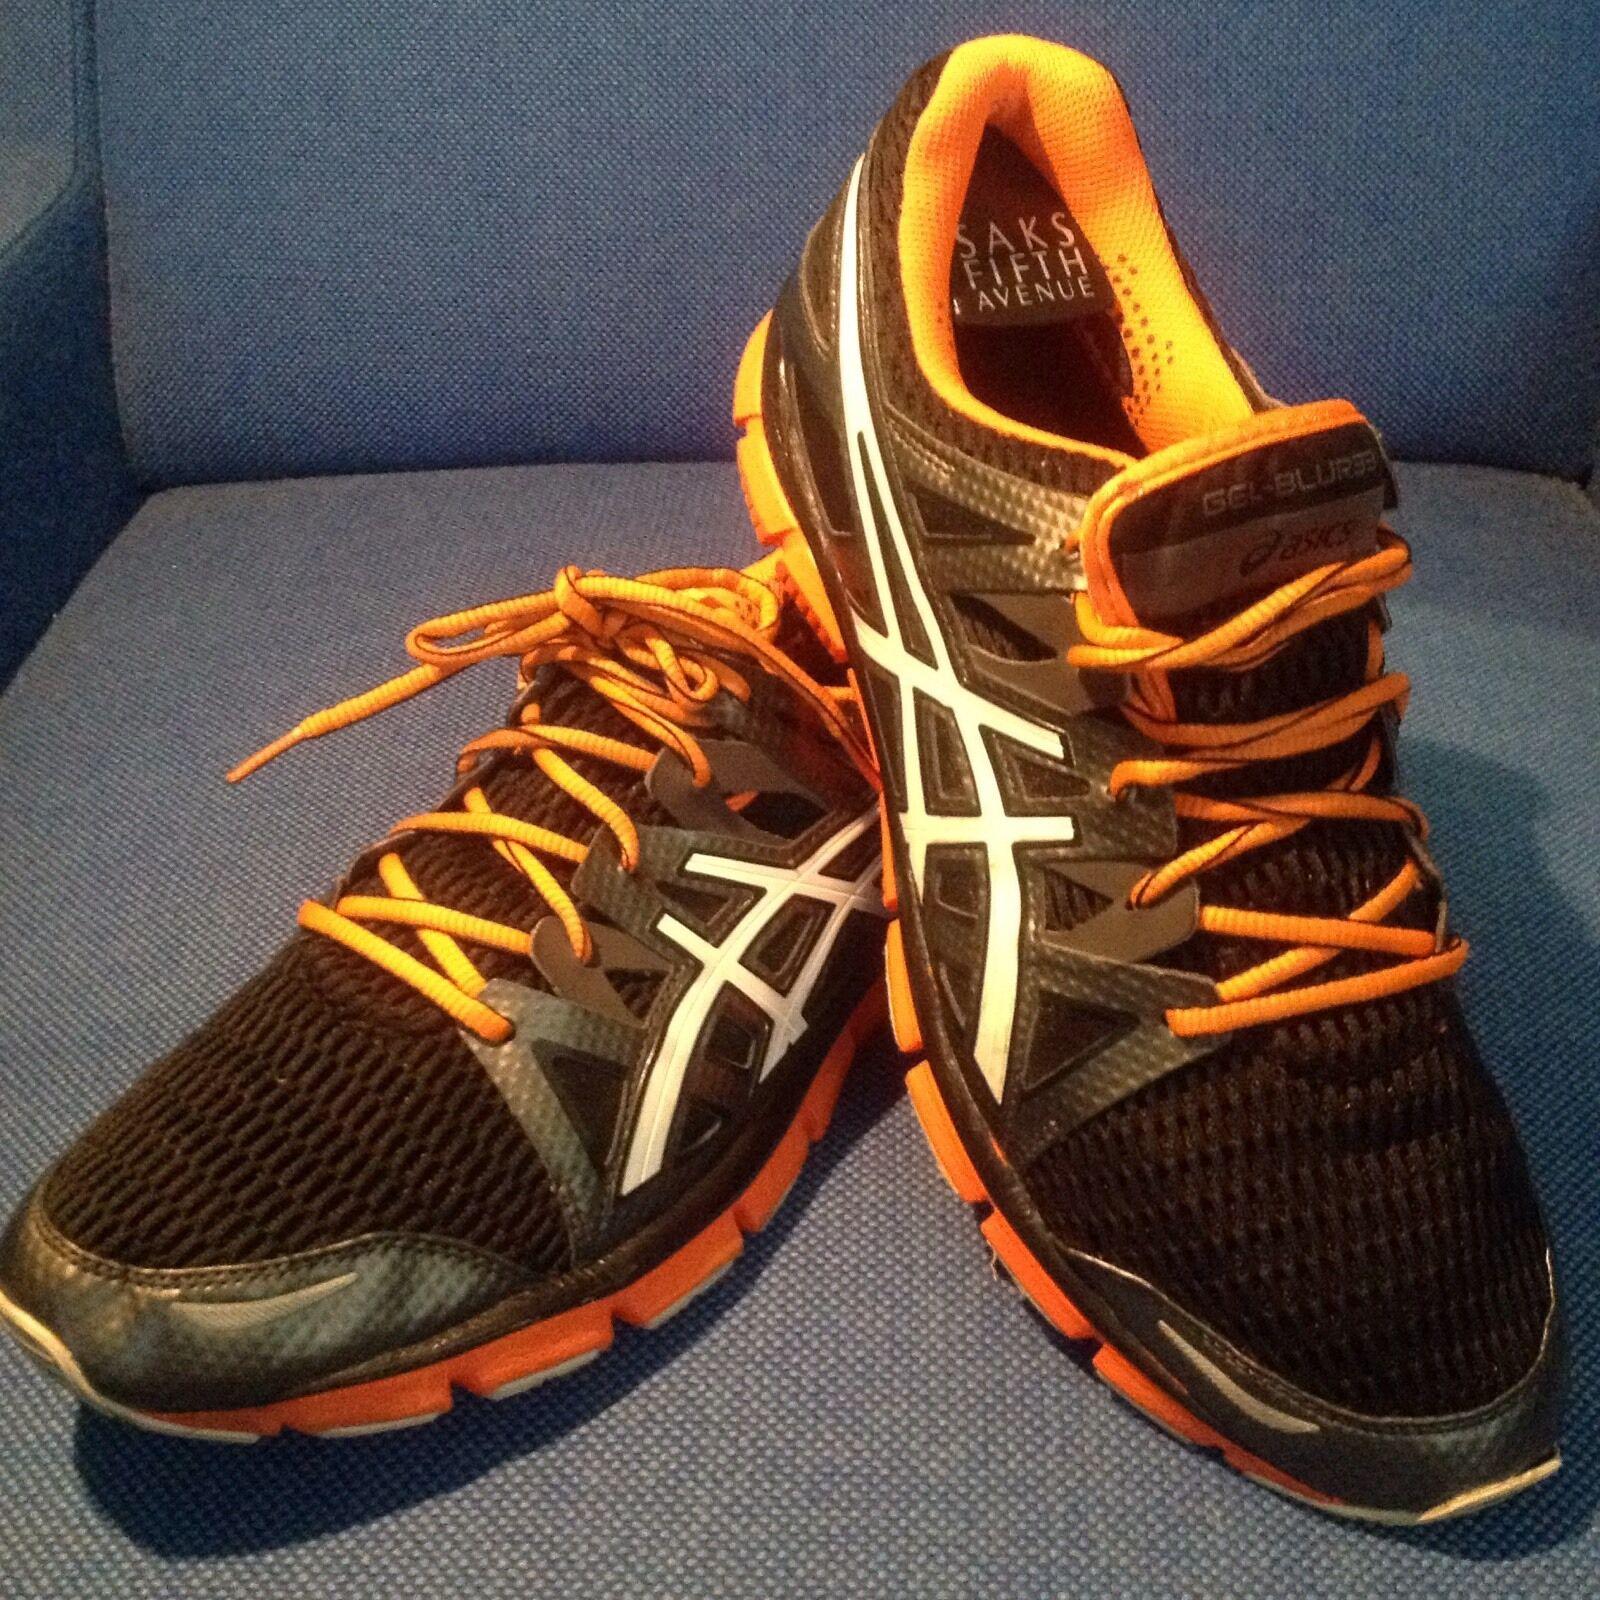 Asics Gel-bluer33 2.0. - Running shoes Trainer - T2H3N 9001 - Men's - Size 12